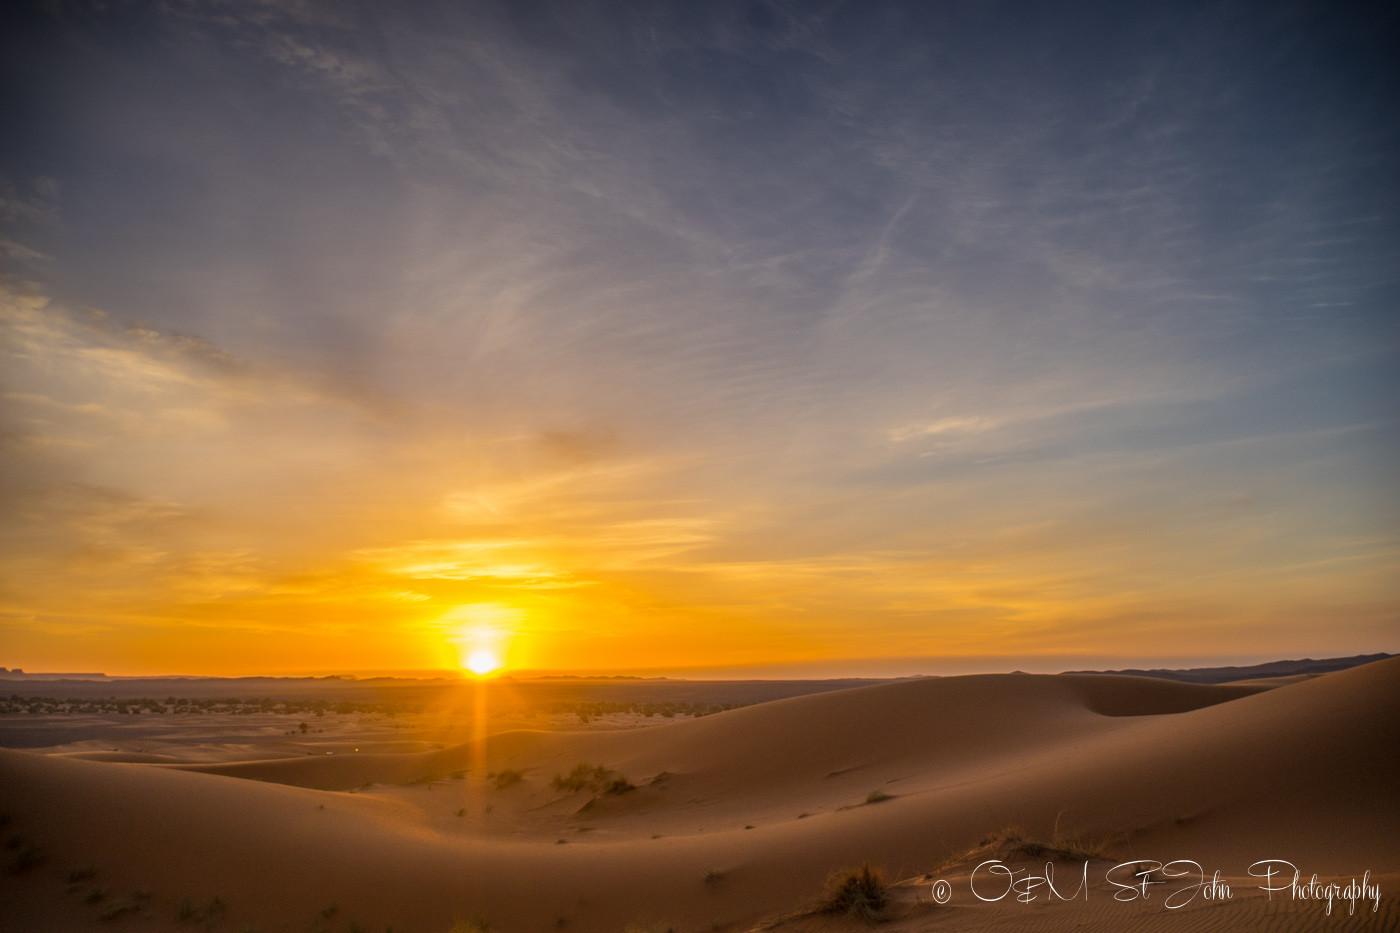 Sunrise in Erg Chebbi, Sahara Desert. Morocco, off the grid vacation